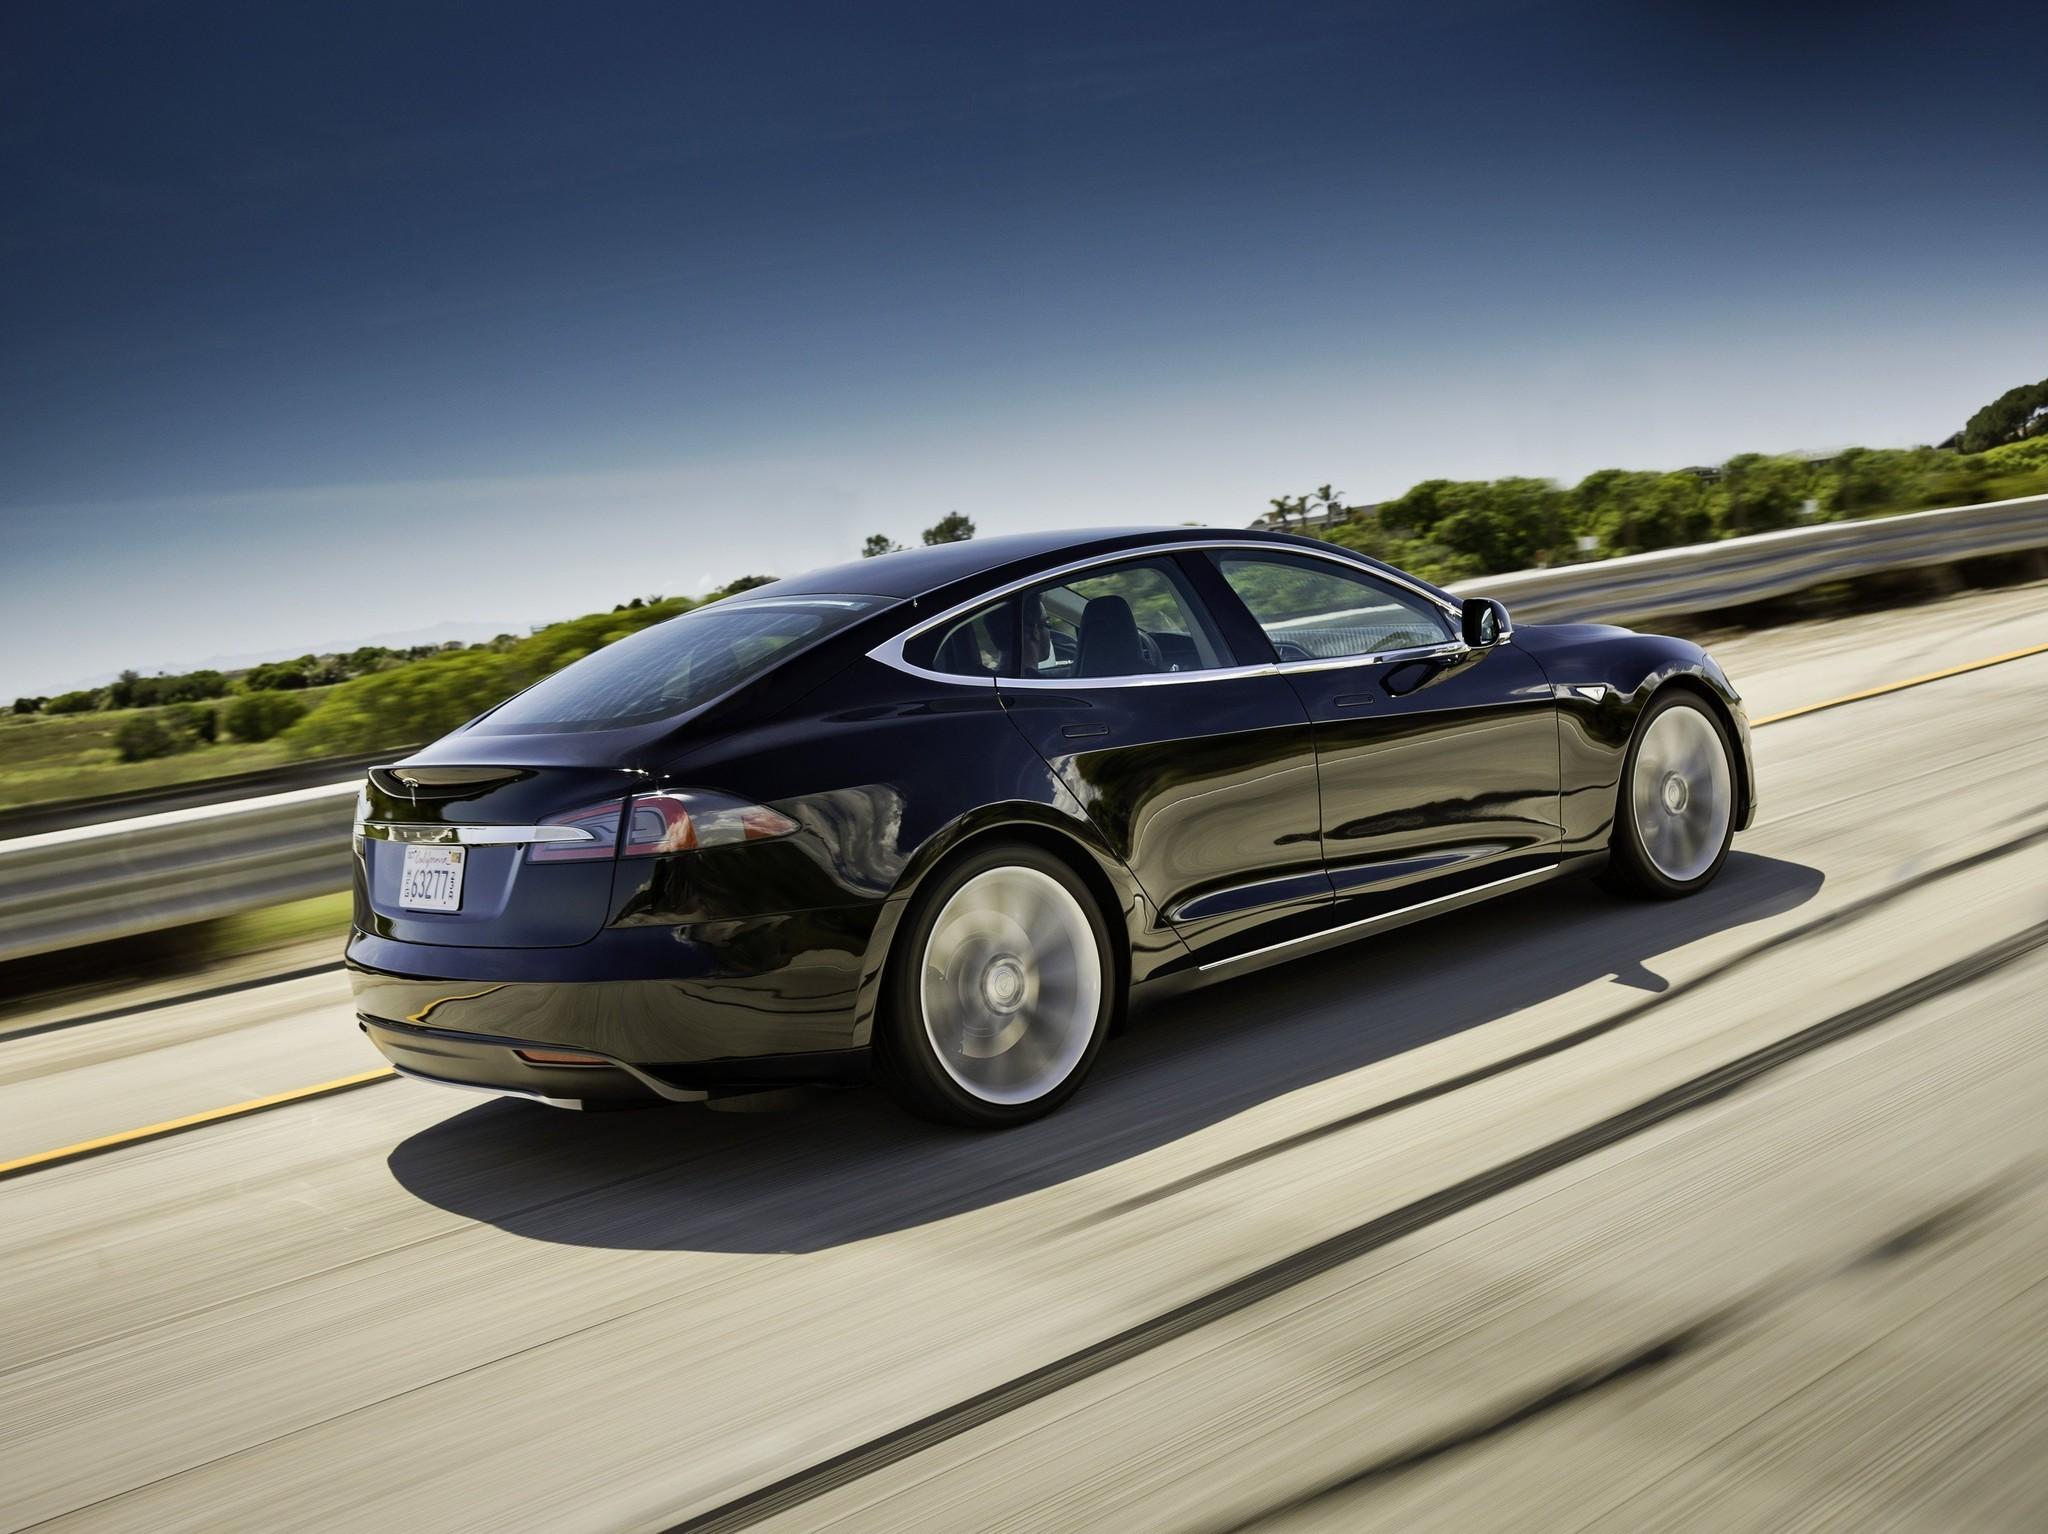 Tesla's Elon Musk defends Model S electric car after fire